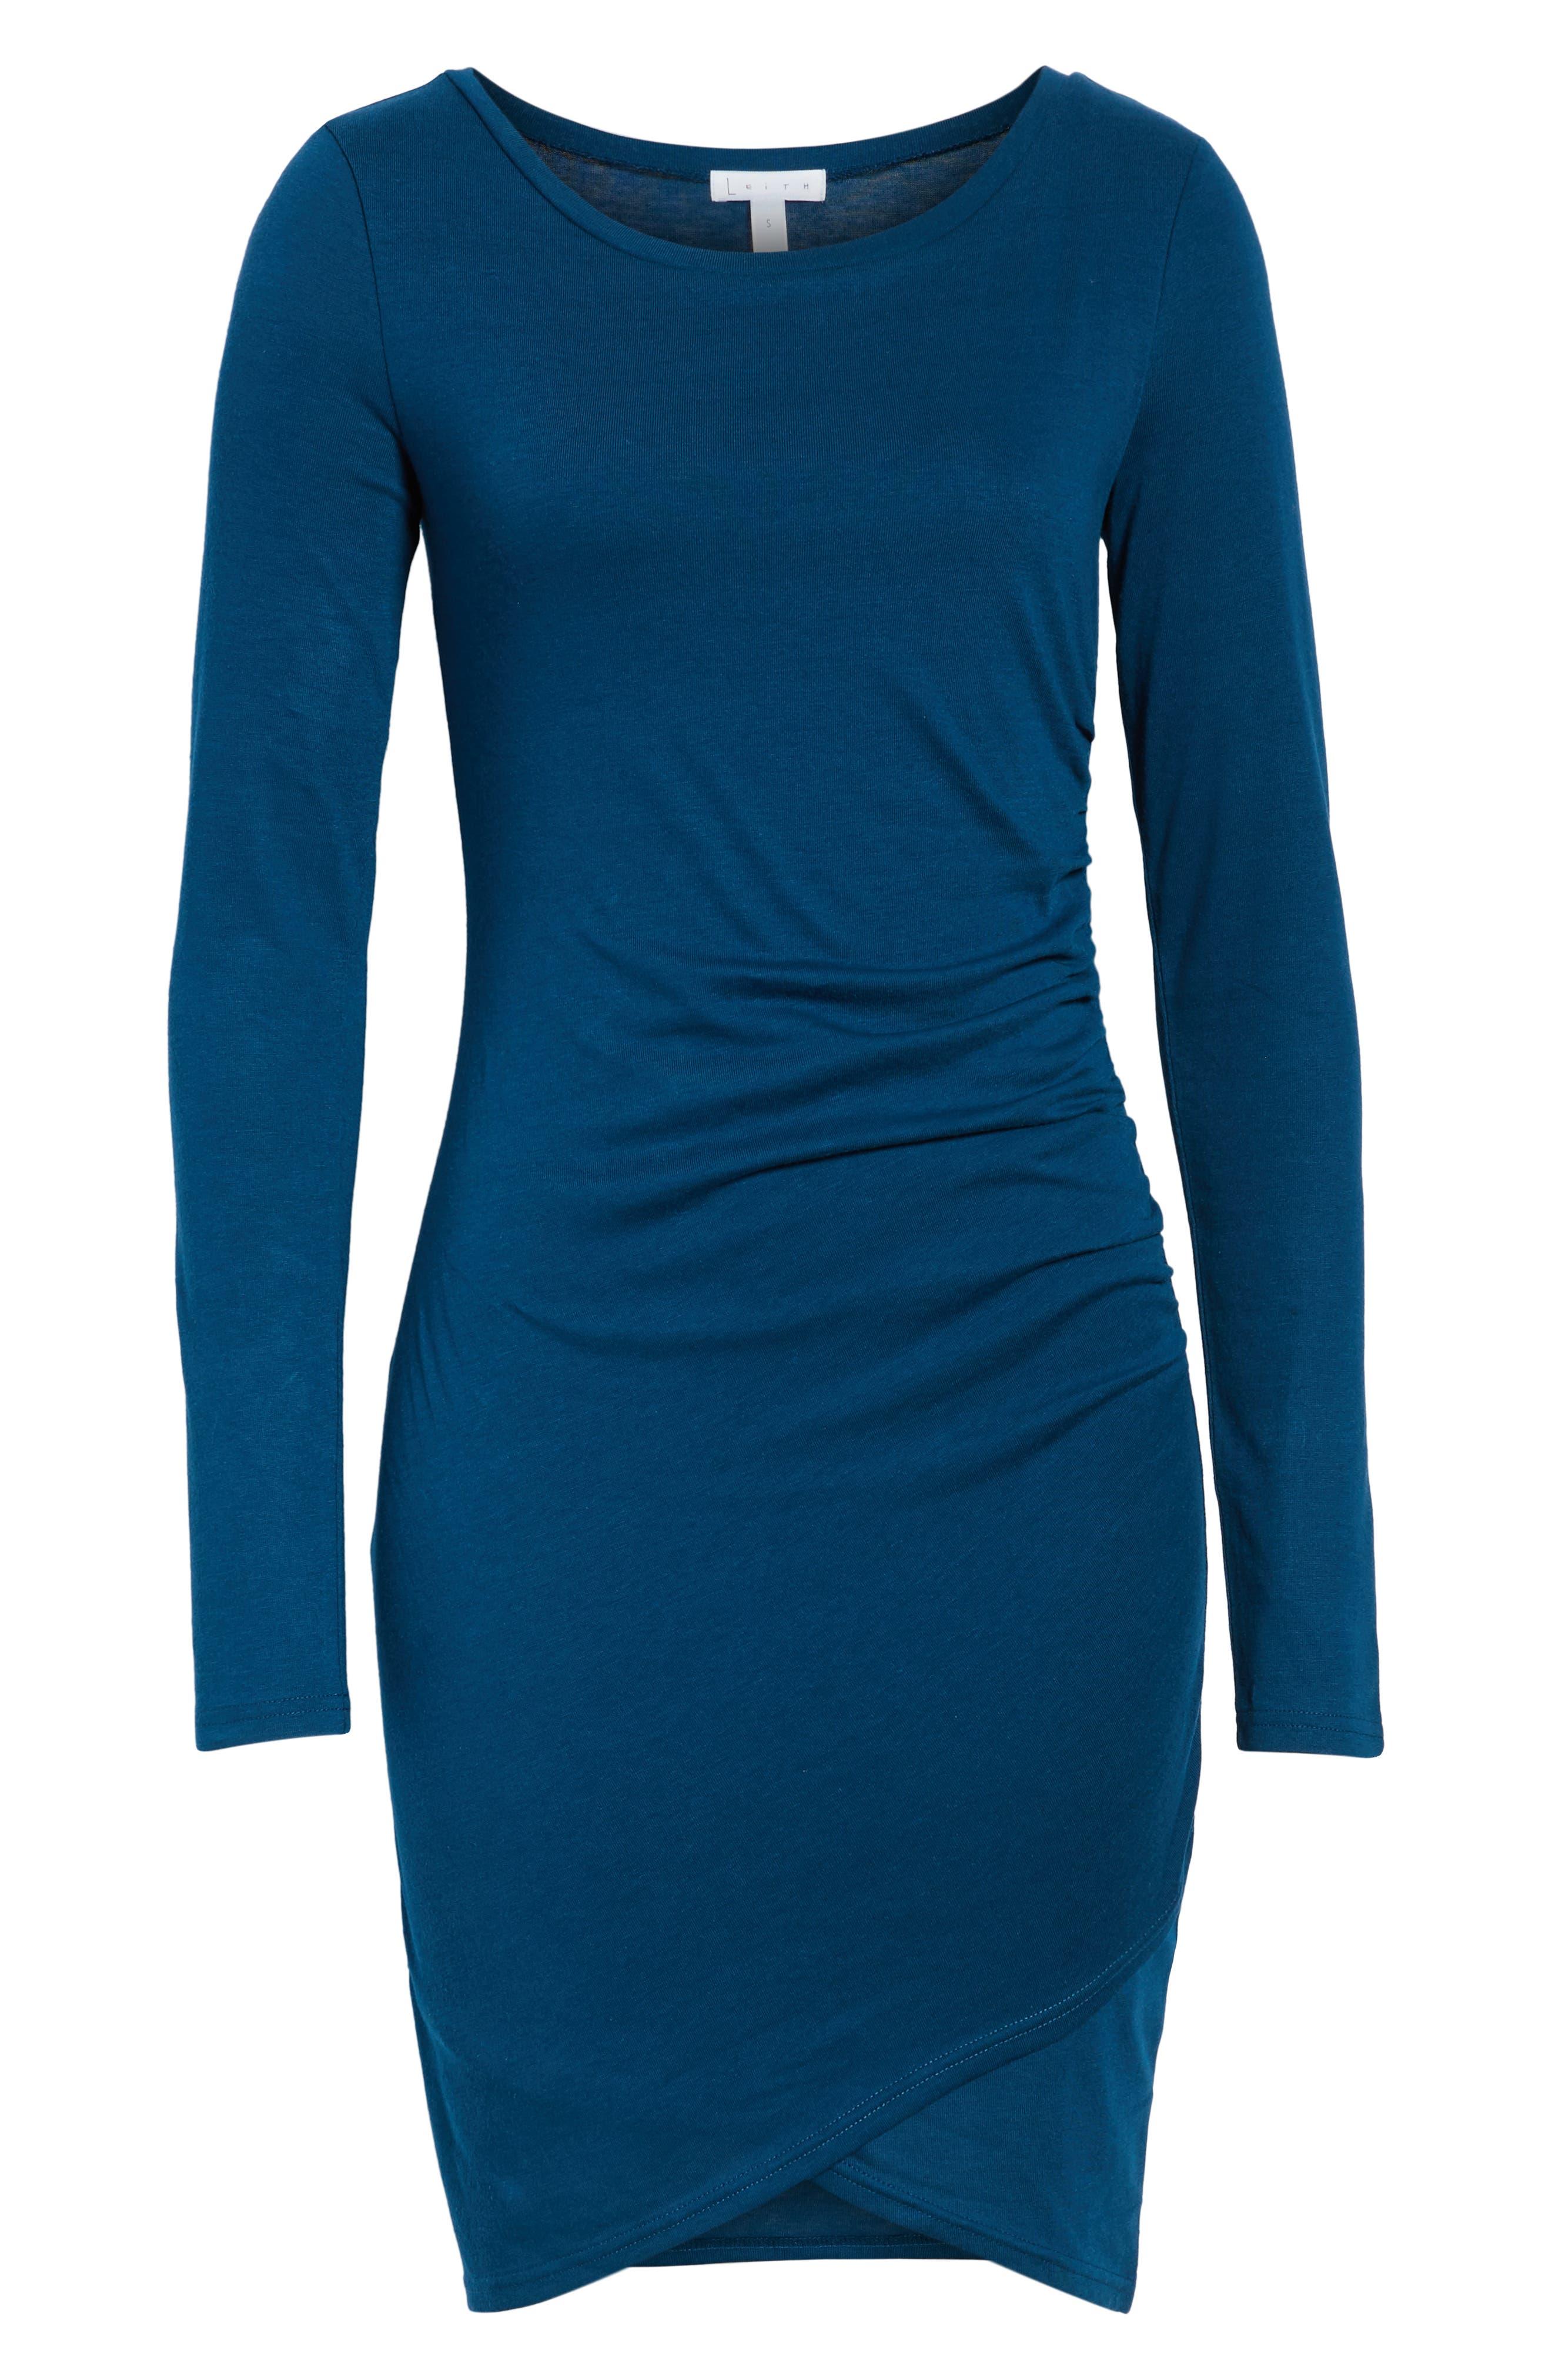 Ruched Long Sleeve Dress,                             Alternate thumbnail 7, color,                             BLUE AURORA